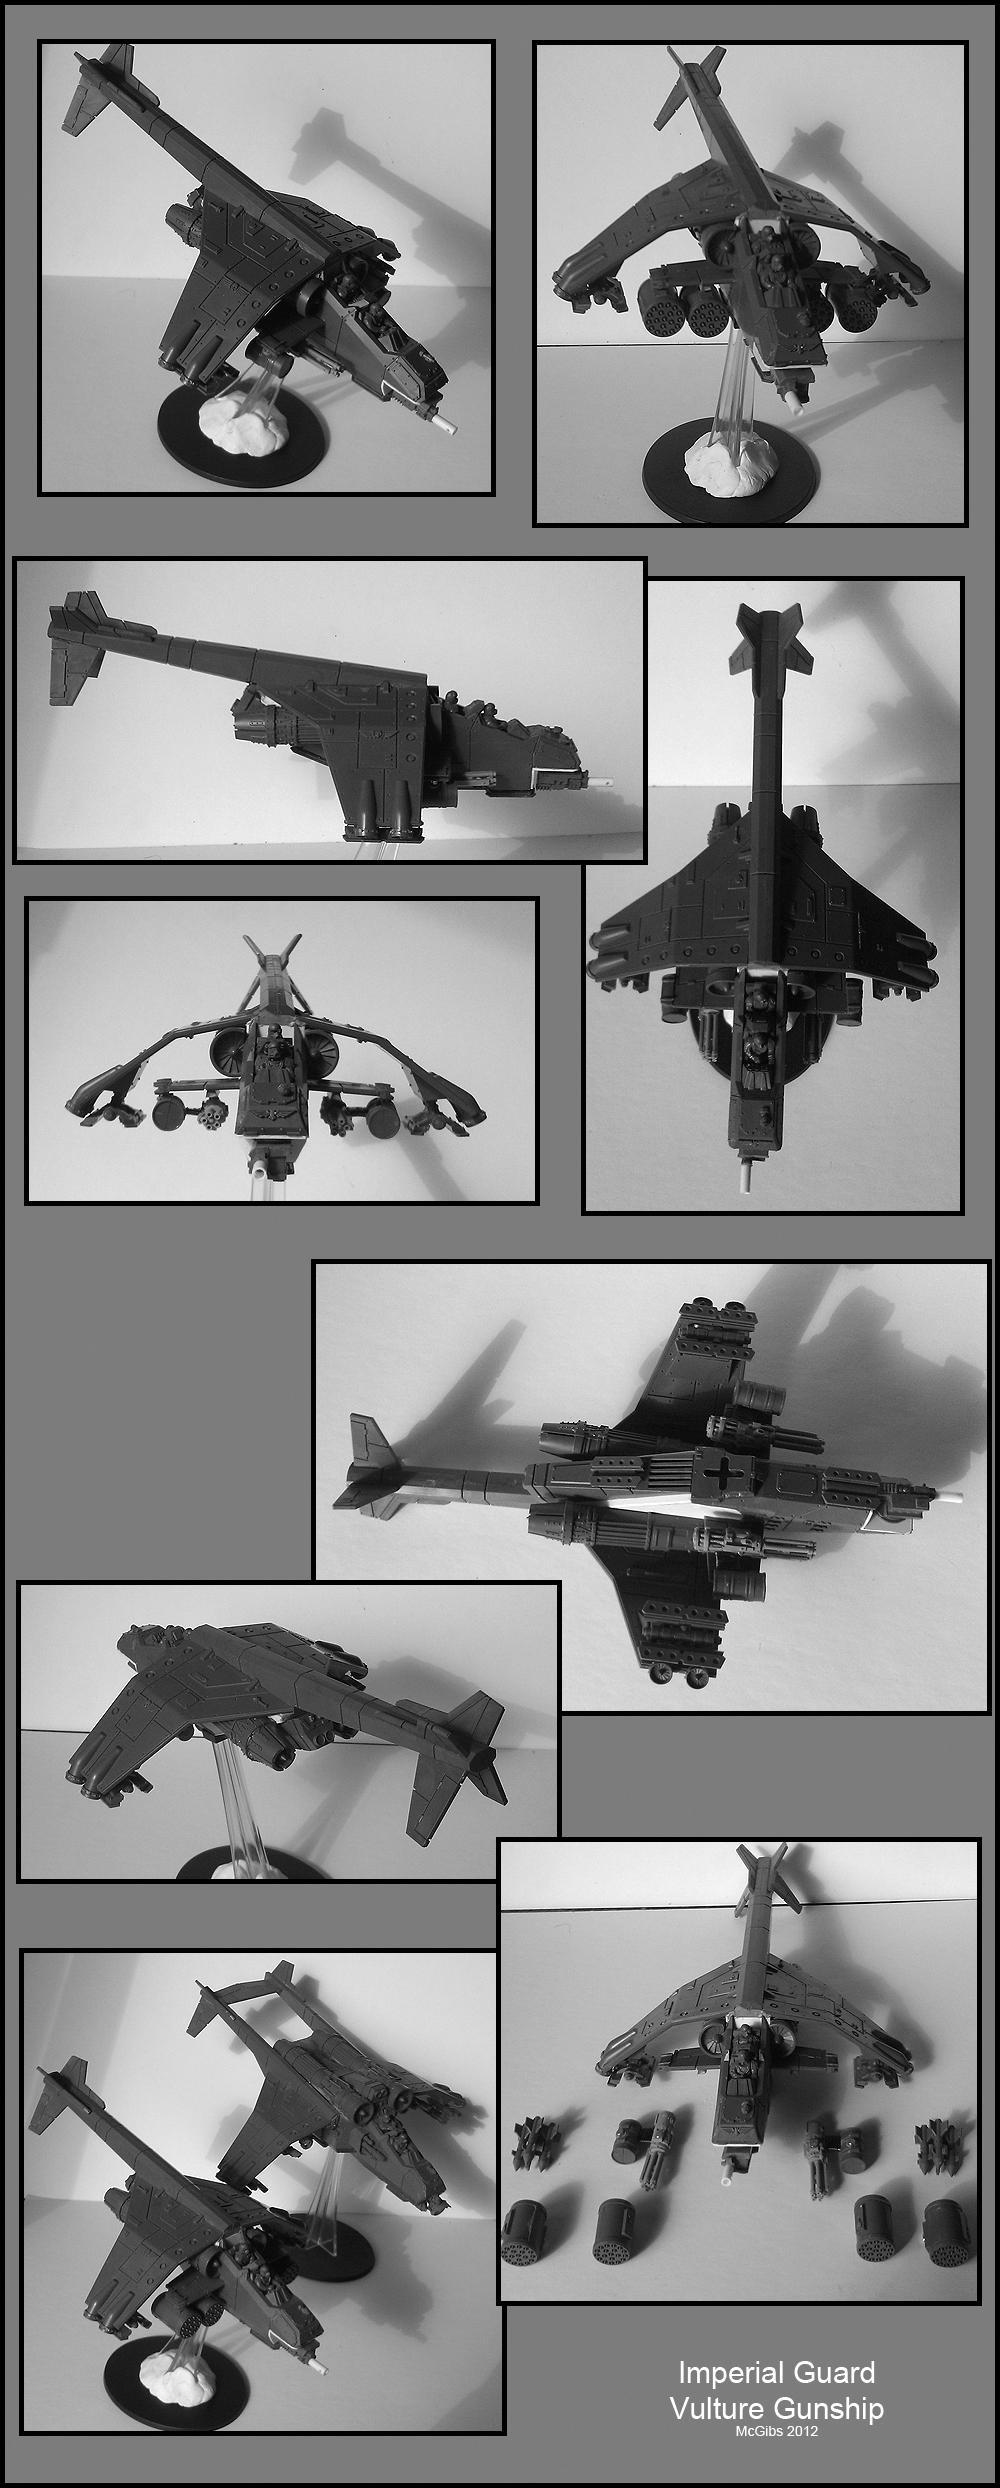 Imperial Guard, Vulture